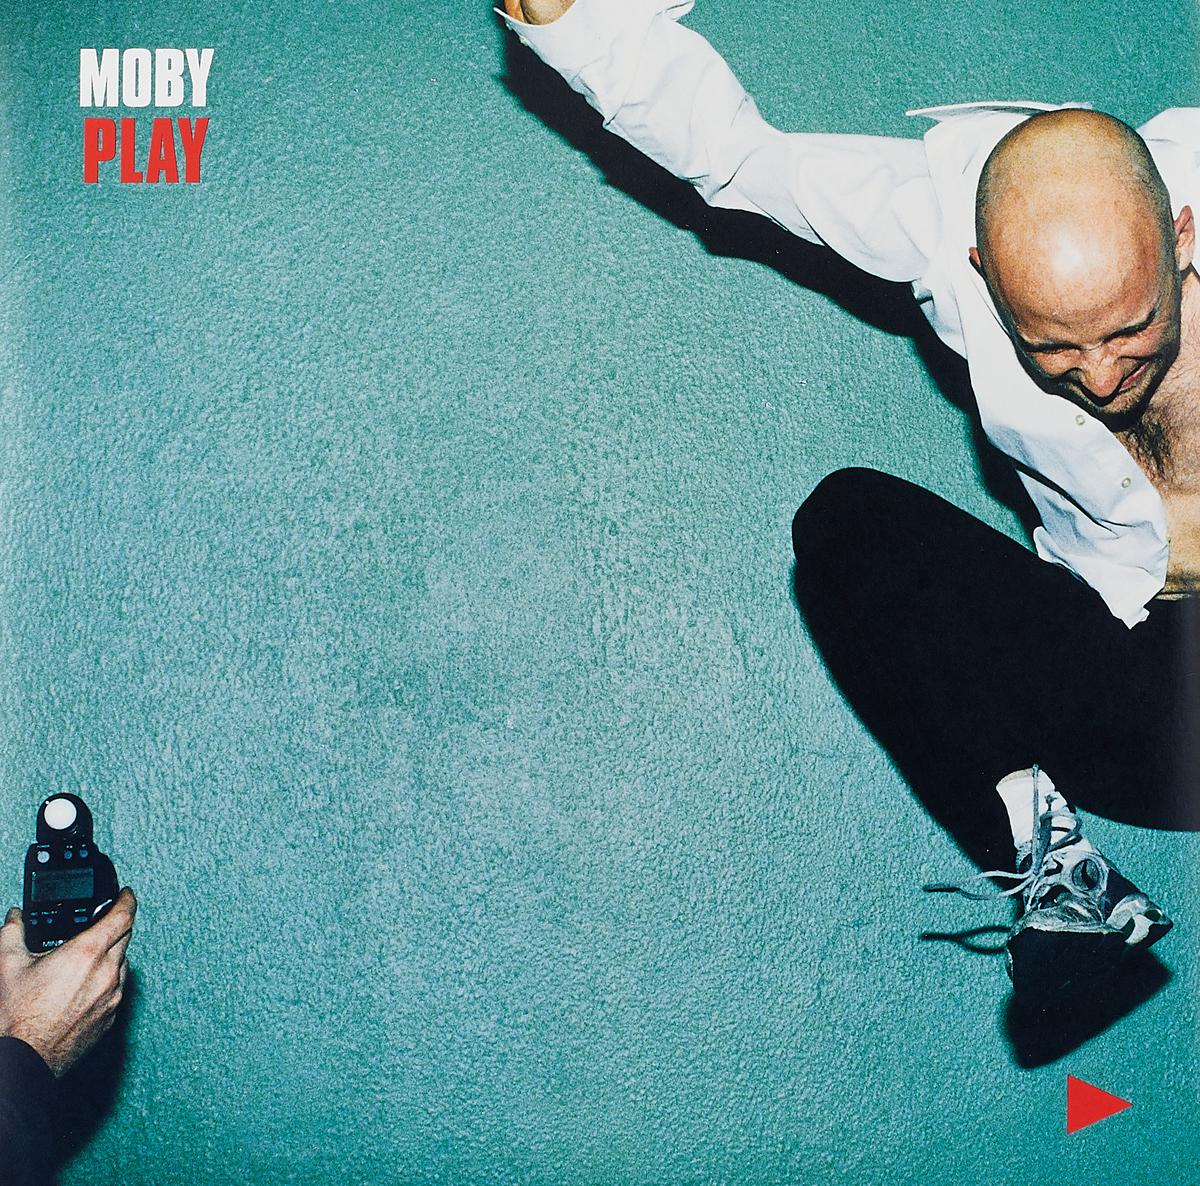 Моби Moby. Play (2 LP) моби moby play 2 lp